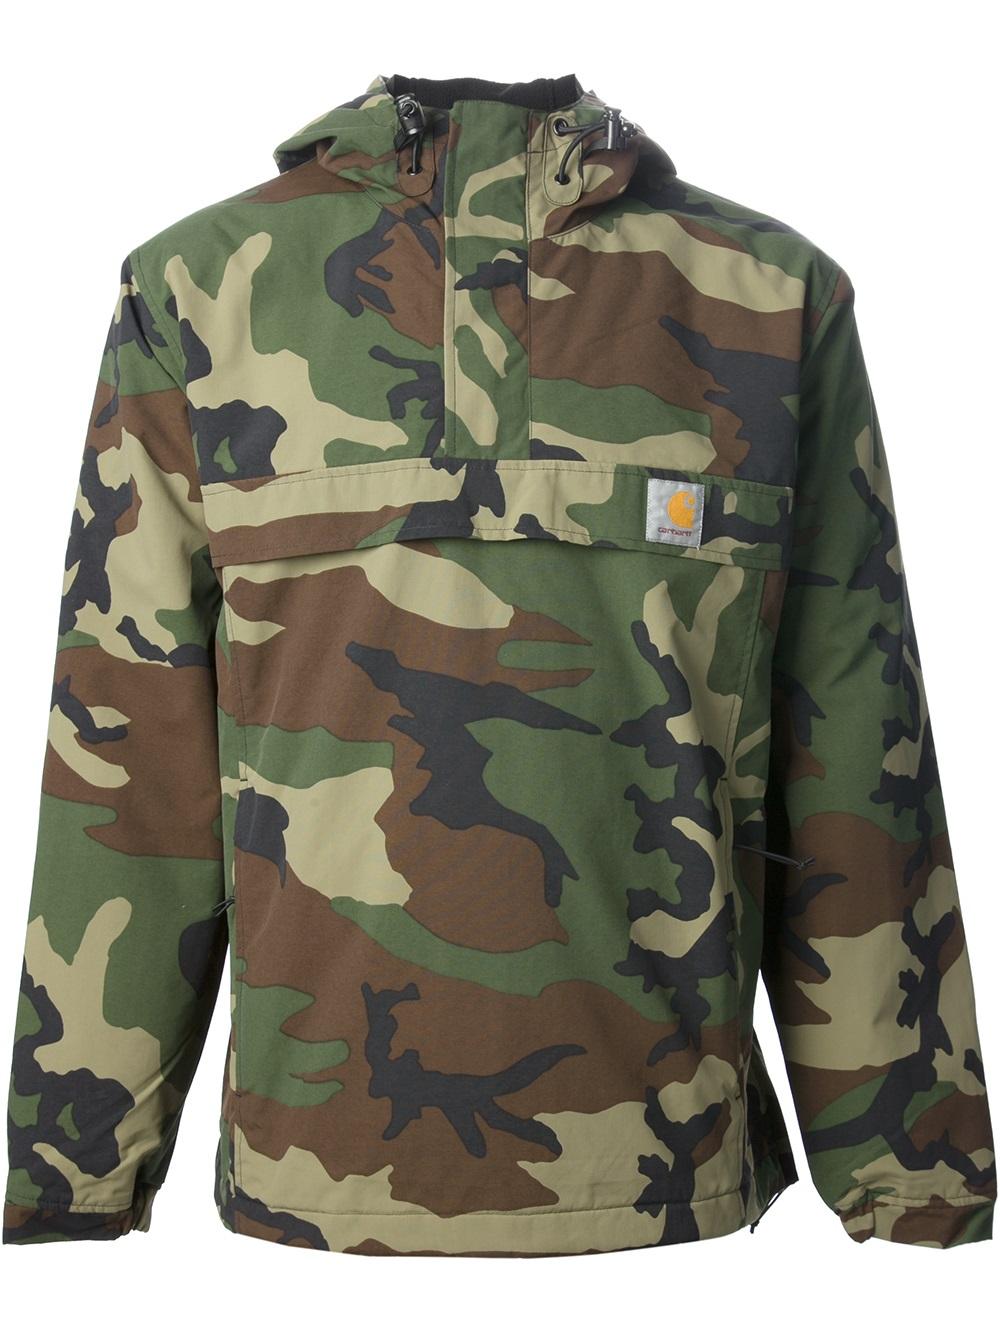 176de91b6d5 Carhartt Nimbus Camouflage Jacket in Green for Men - Lyst